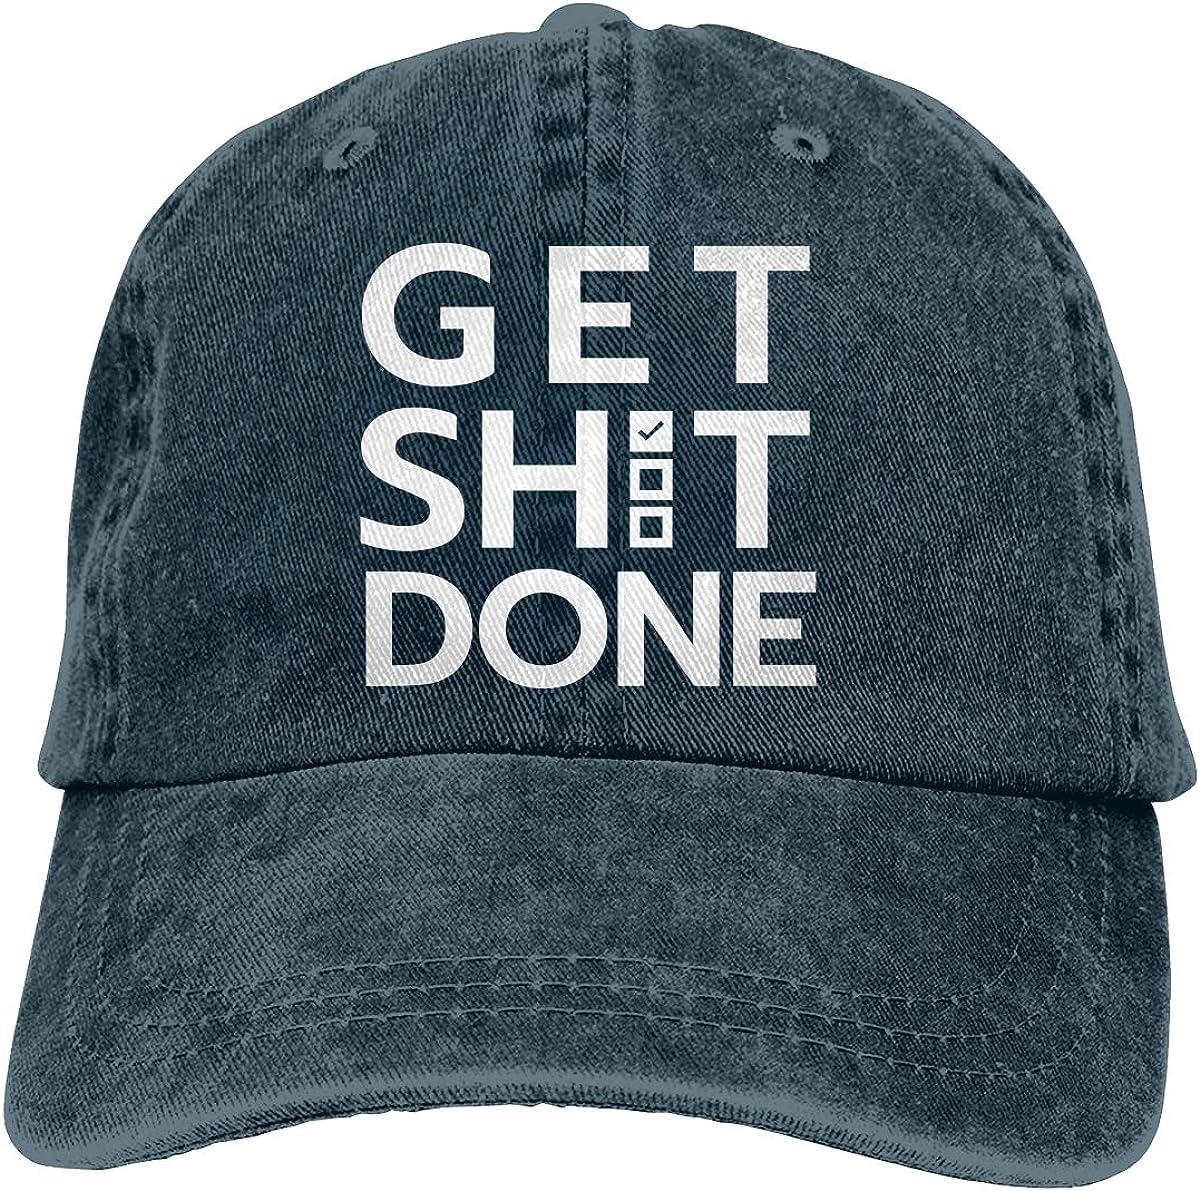 Get Shit Done 2-1 Unisex Custom Jeans Hip Hop Cap Adjustable Baseball Cap